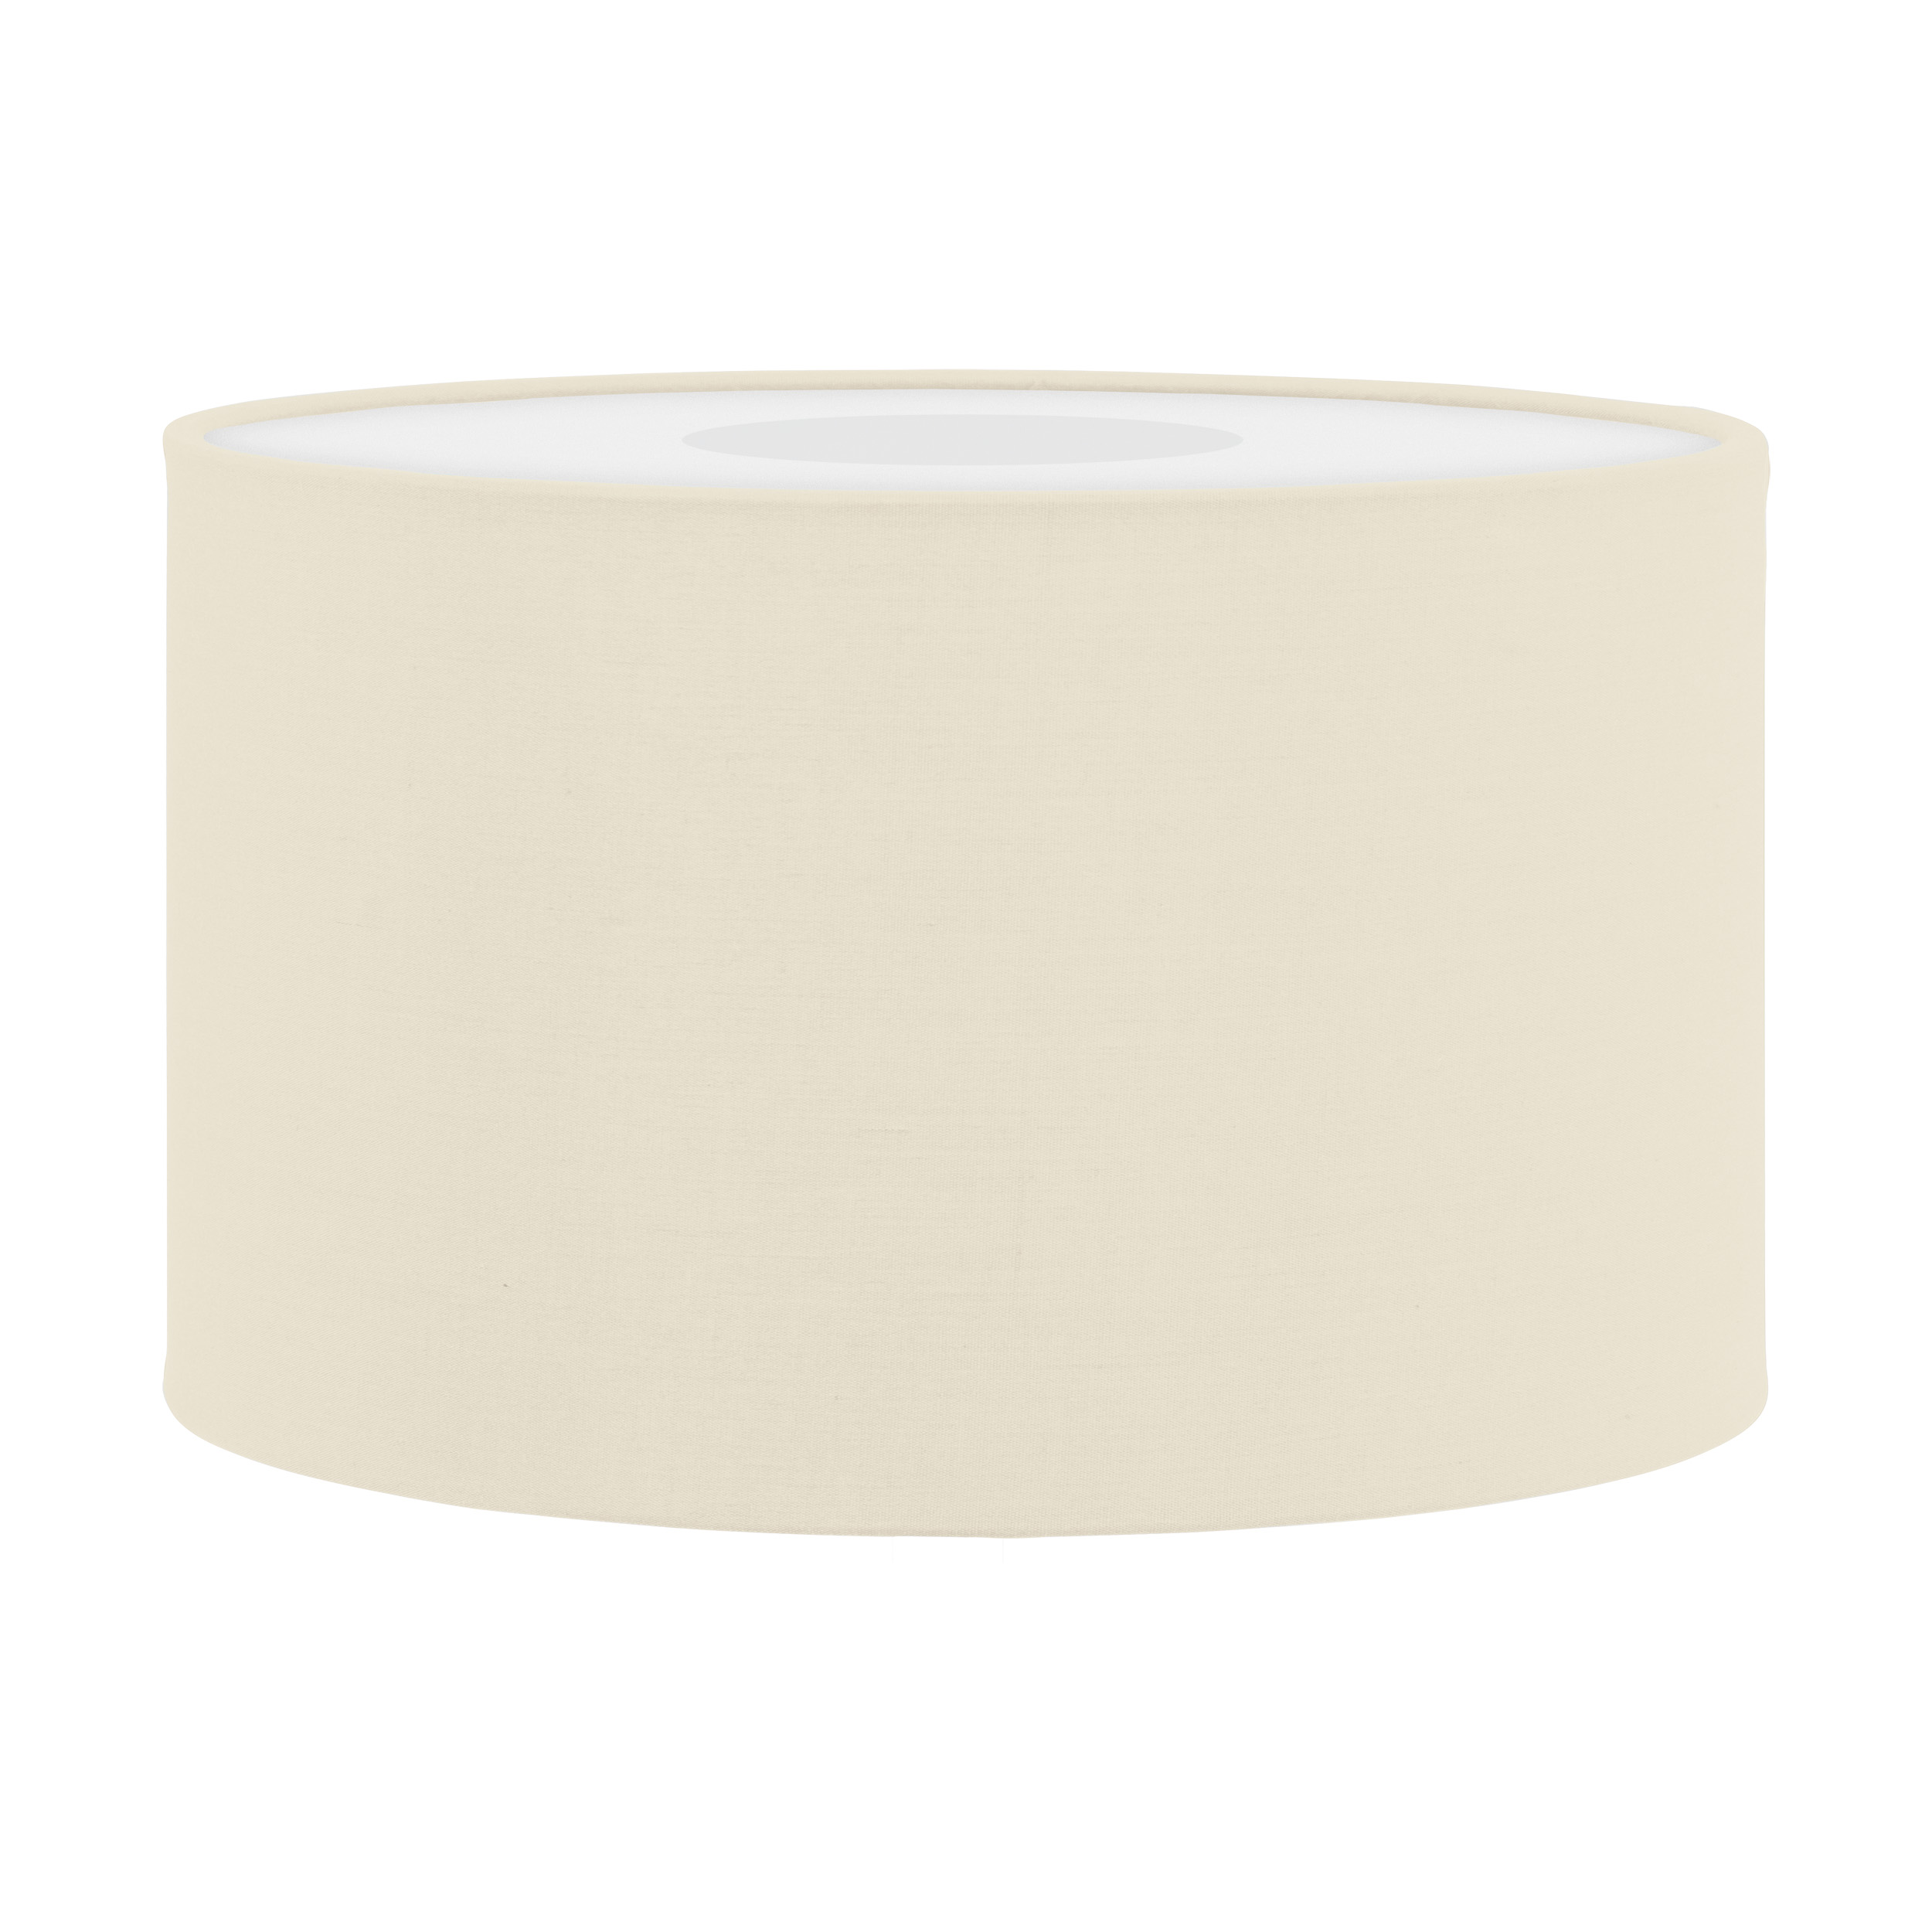 1 Stk Schirm Pasteri Pro inkl. Diffuser creme  LI62656---